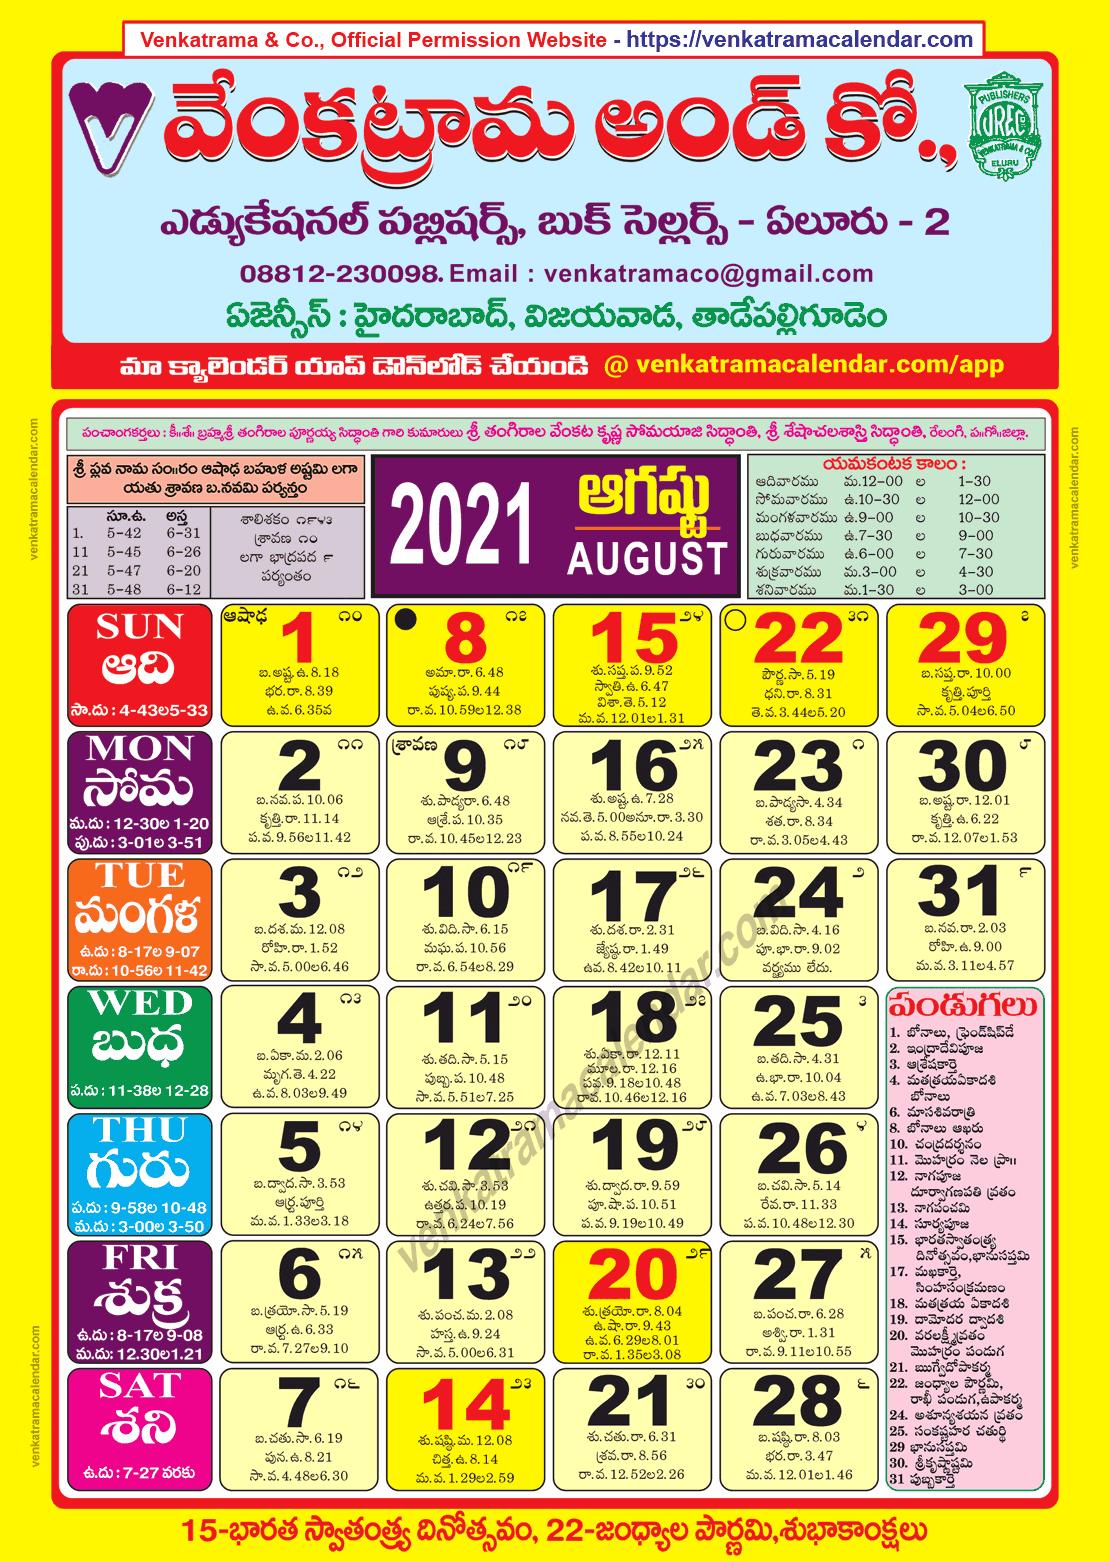 Telugu Calendar 2022 August.Venkatrama Co 2021 August Telugu Calendar Colour